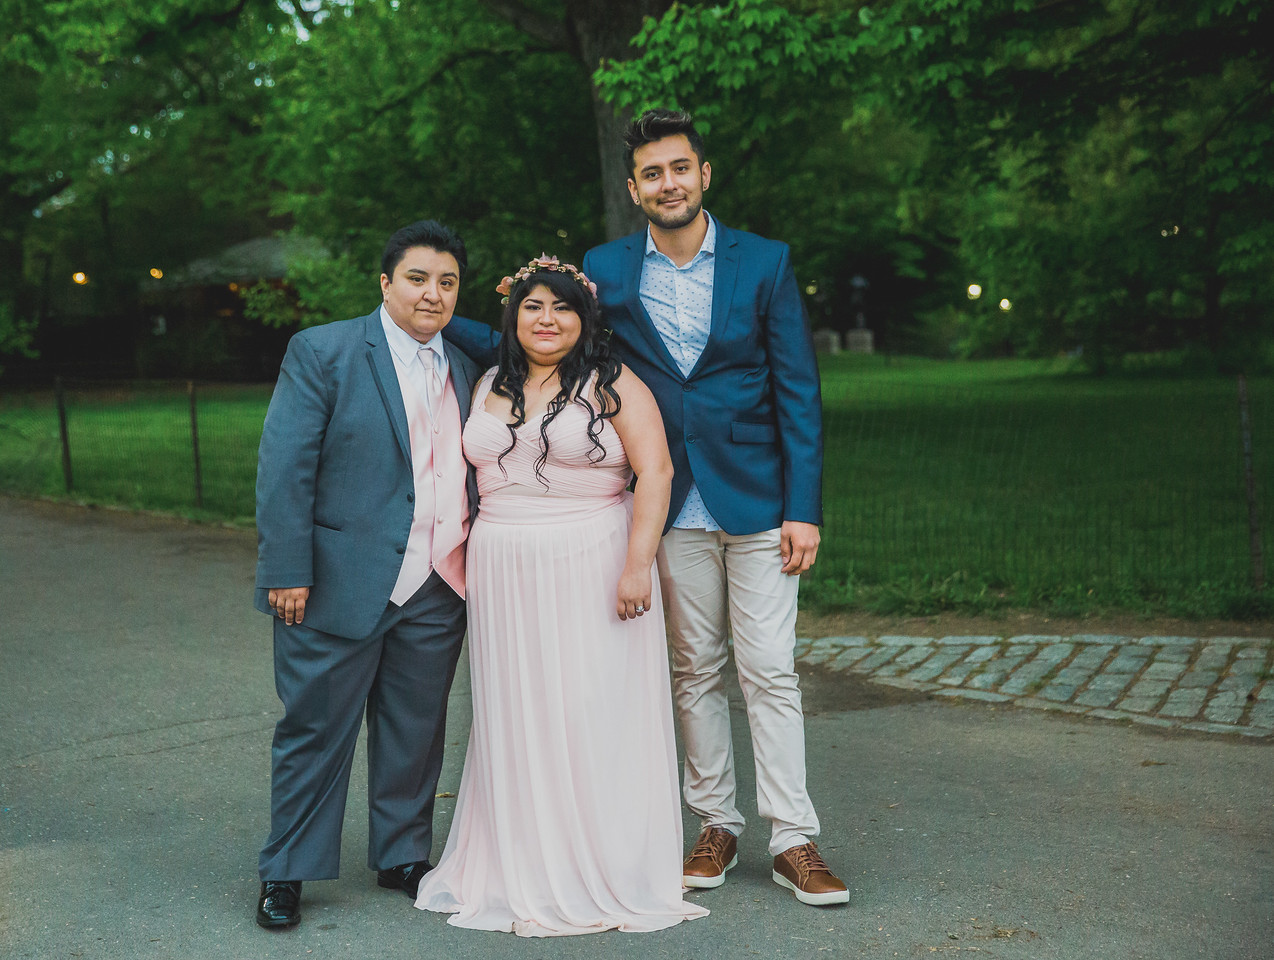 Central Park Wedding - Maria & Denisse-153